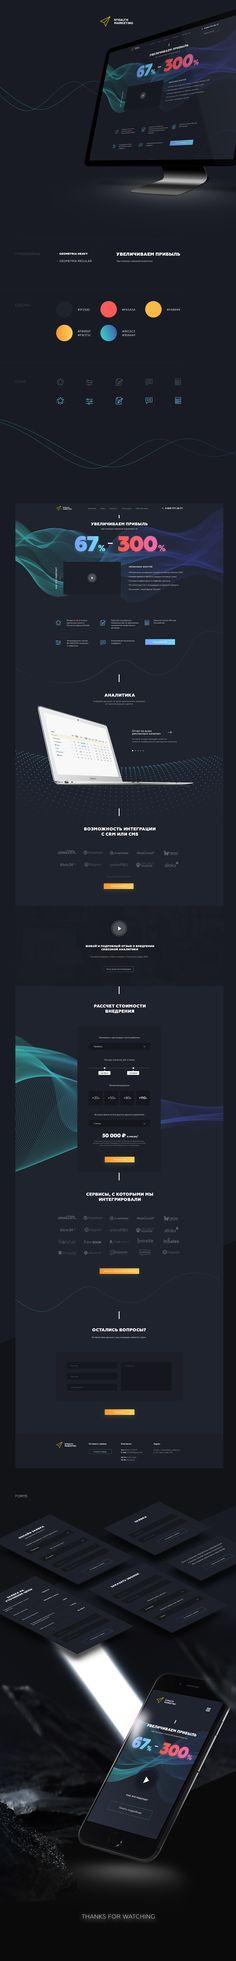 Stealth on Behance Web Design, Graphic Design, World Code, Web Inspiration, Mobile Design, User Experience, Interactive Design, Presentation Design, User Interface